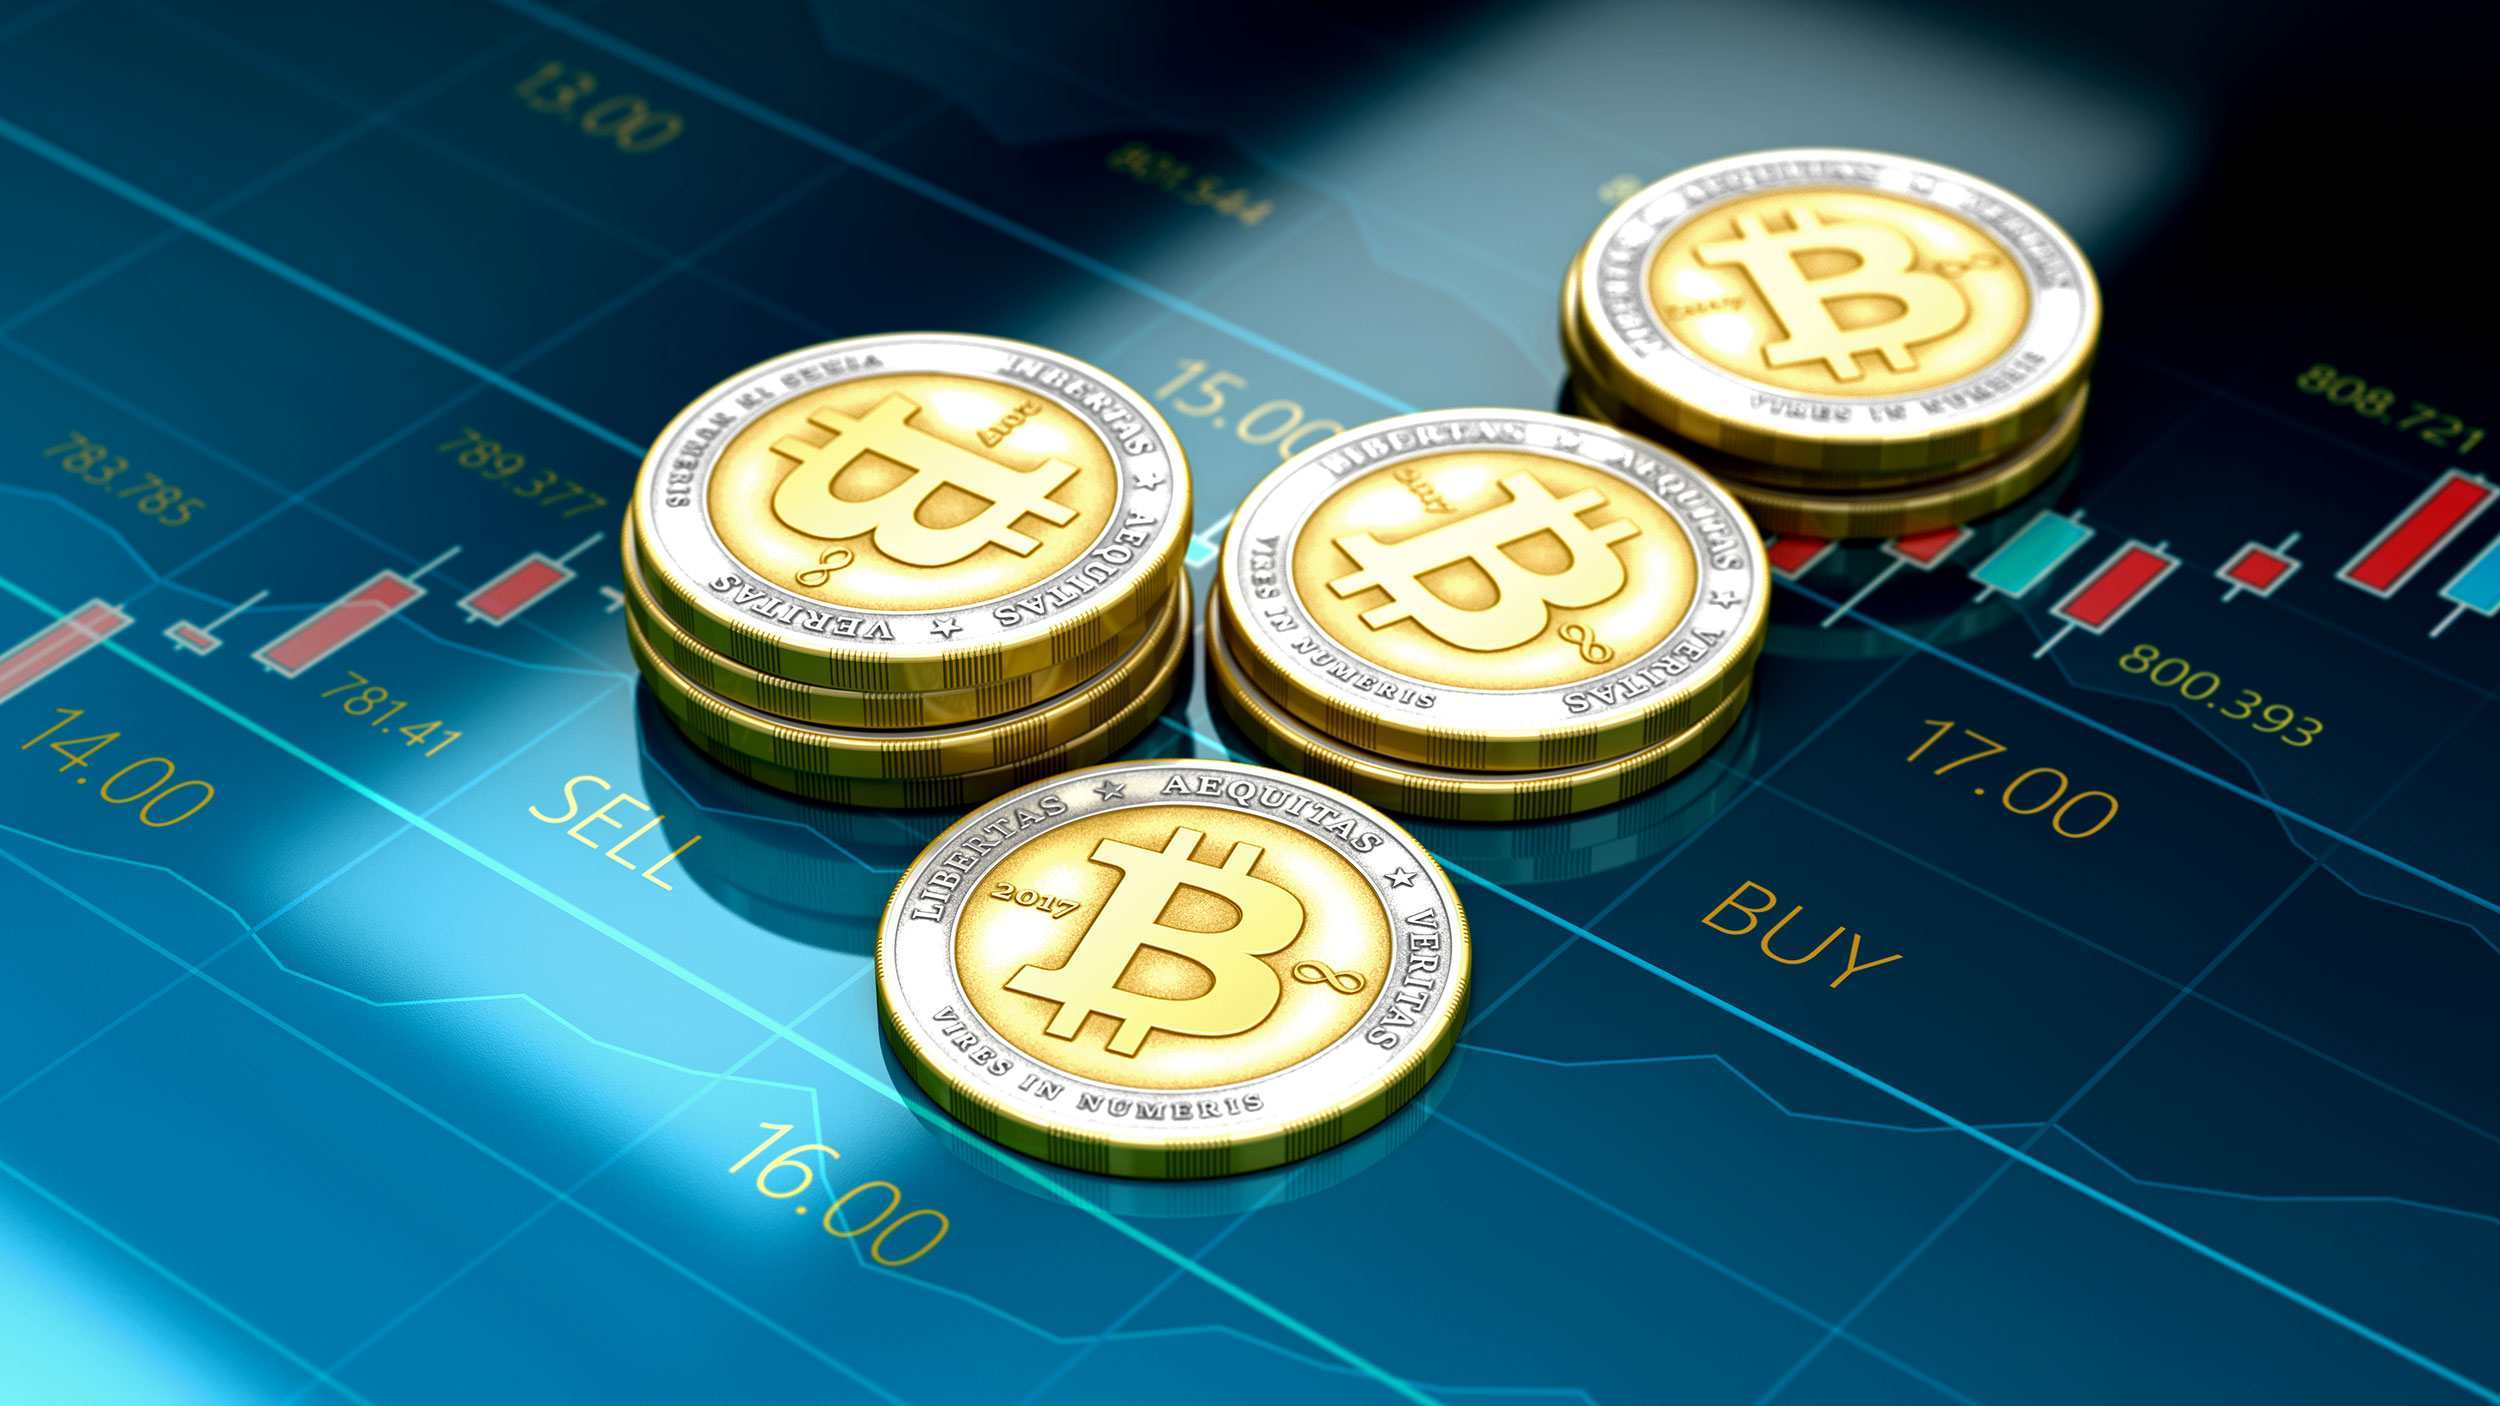 Bitcoins-on-financial-data-chart.jpg